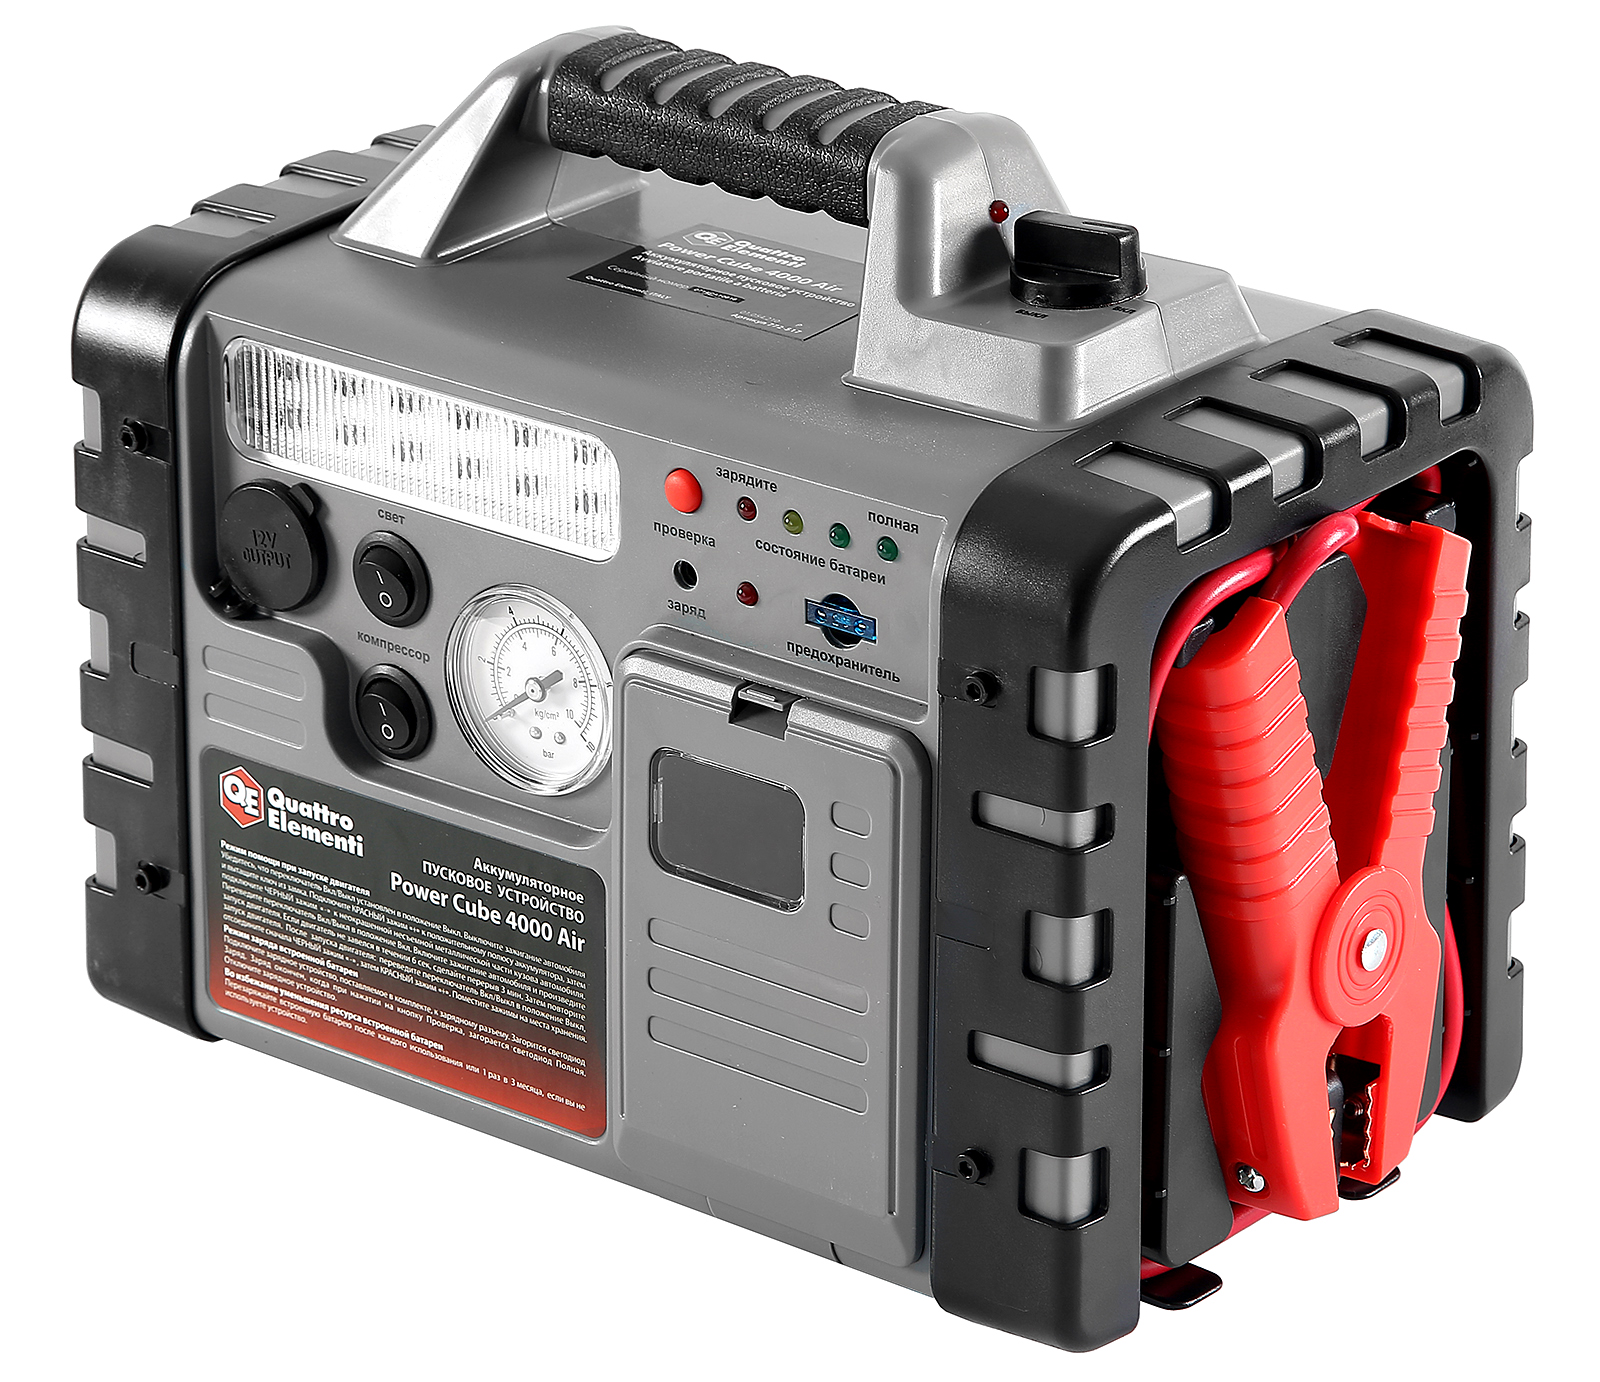 Powercube 4000 air 220 Вольт 5890.000